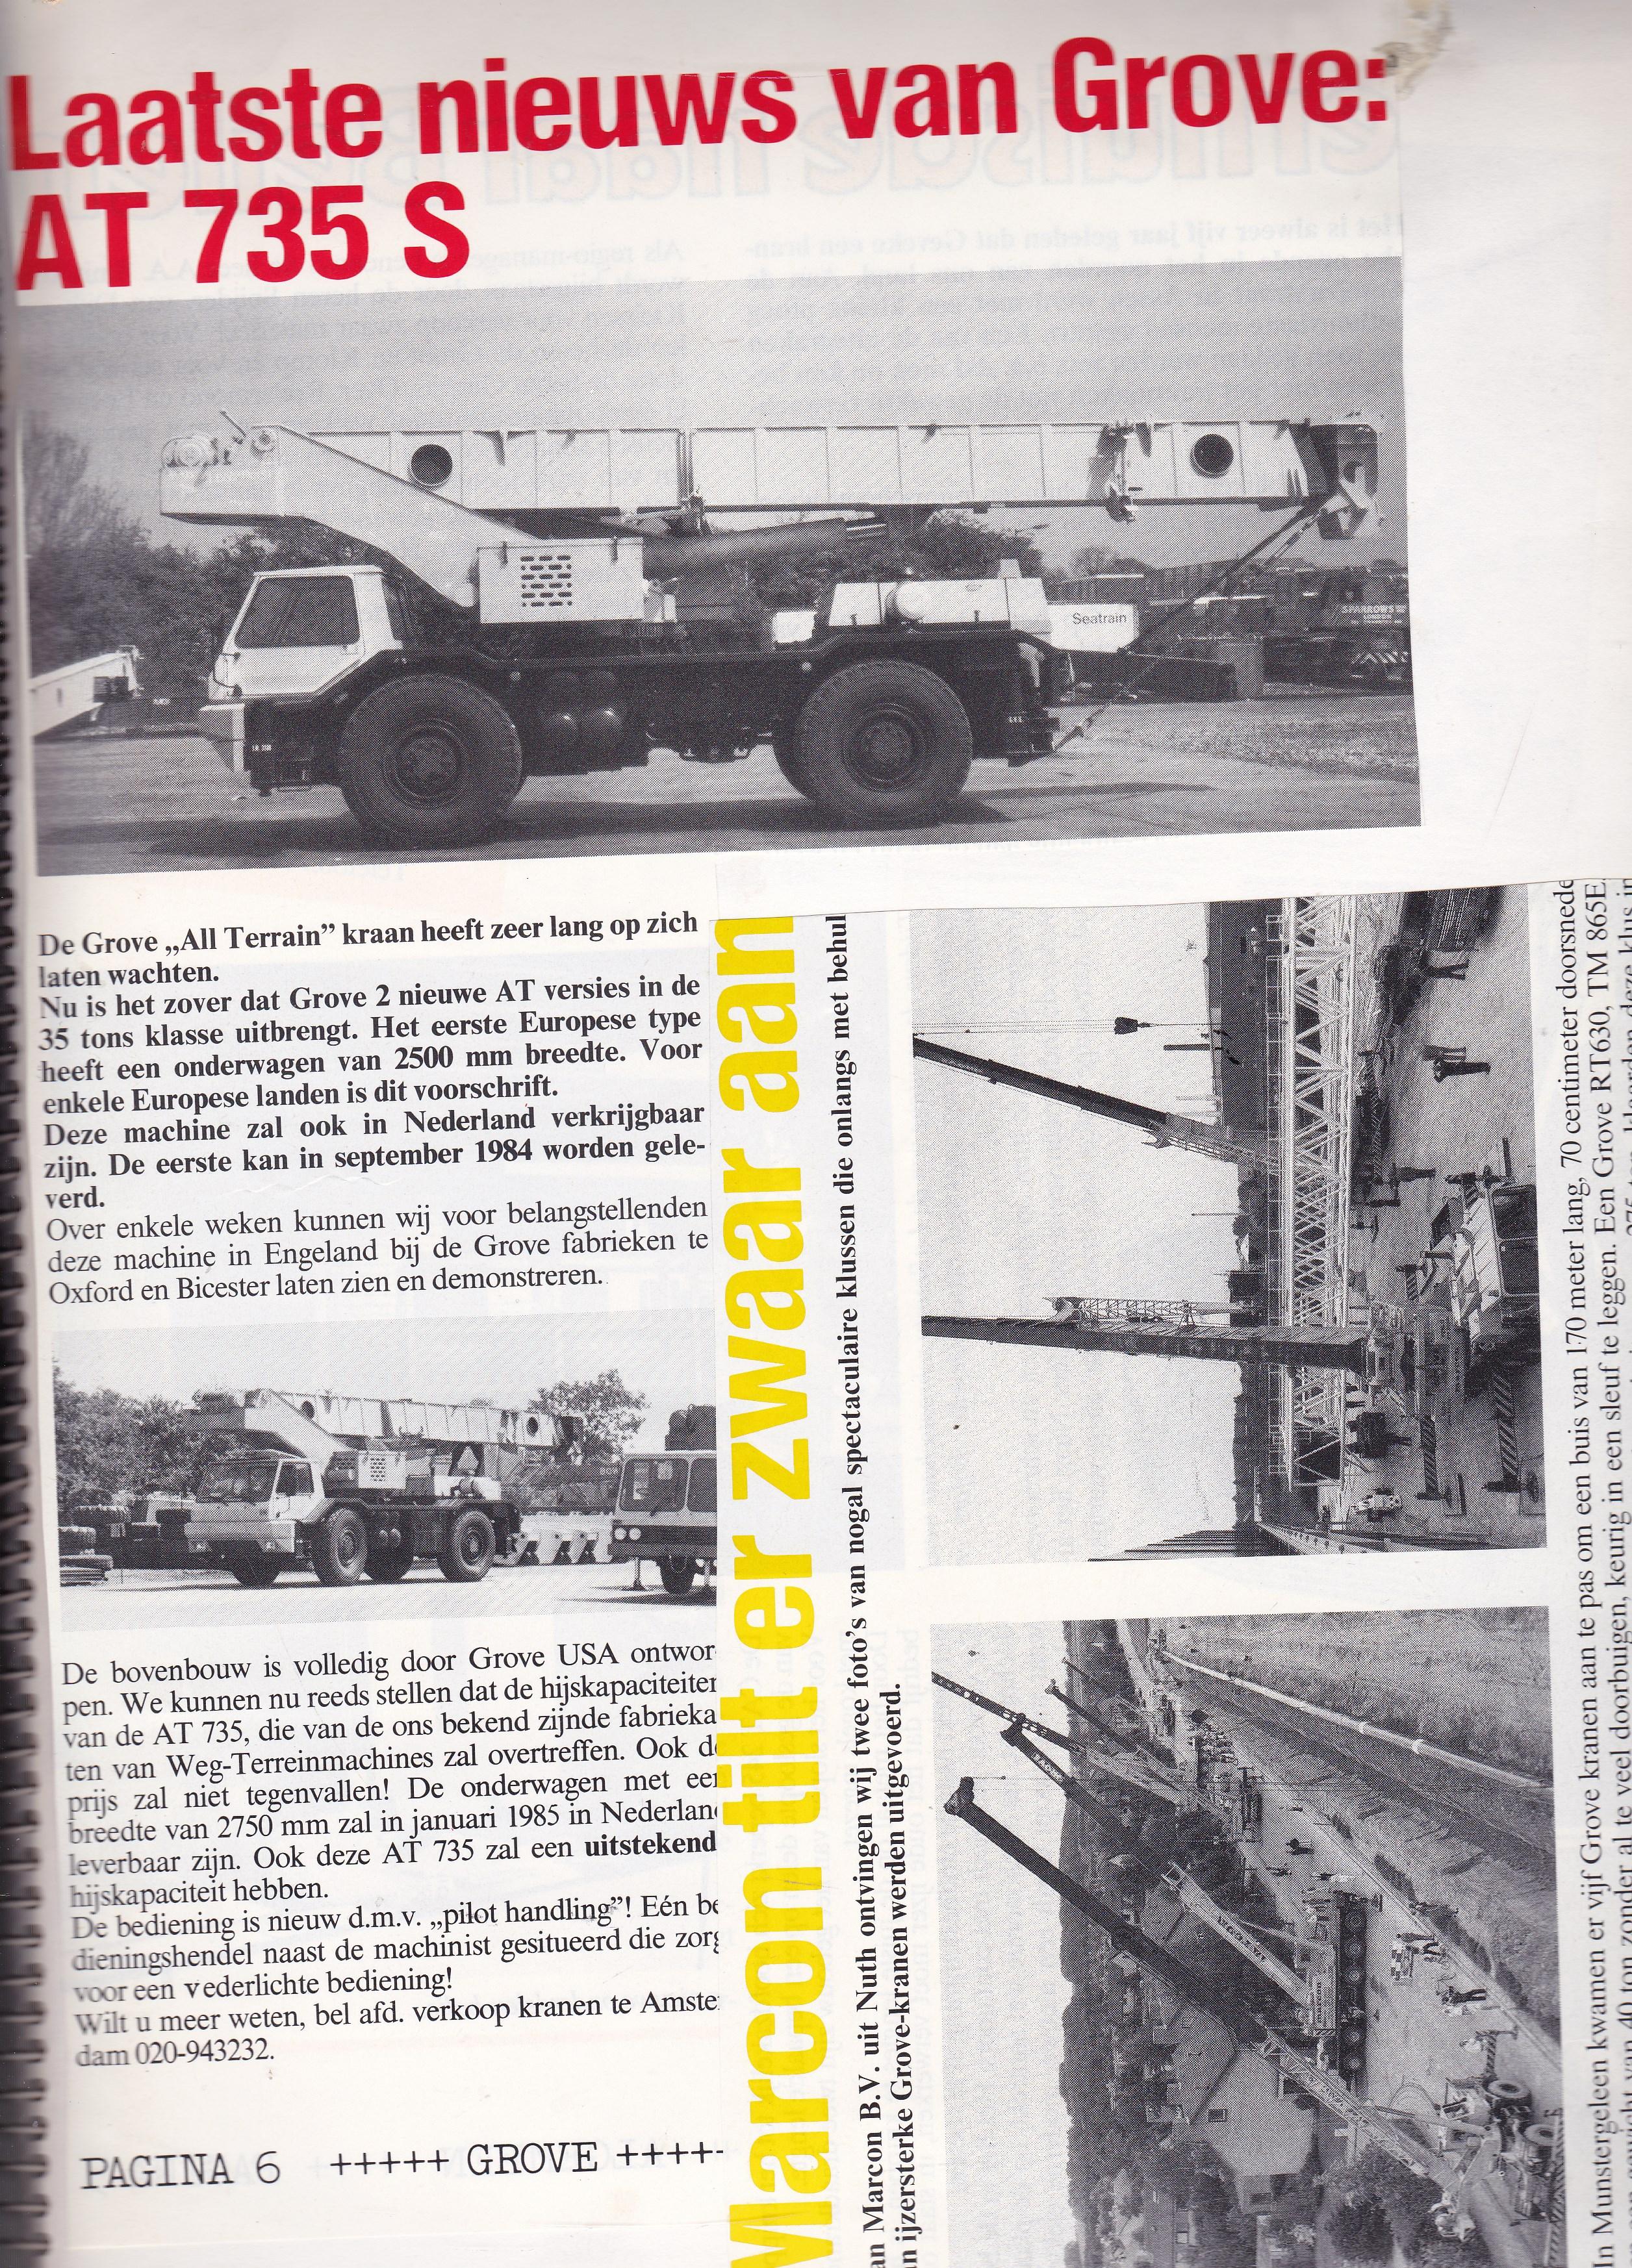 Grove-kranen-in--Zuid-Lbg-Marcom-Nuth-1984-Rinus-Anker-archief--2